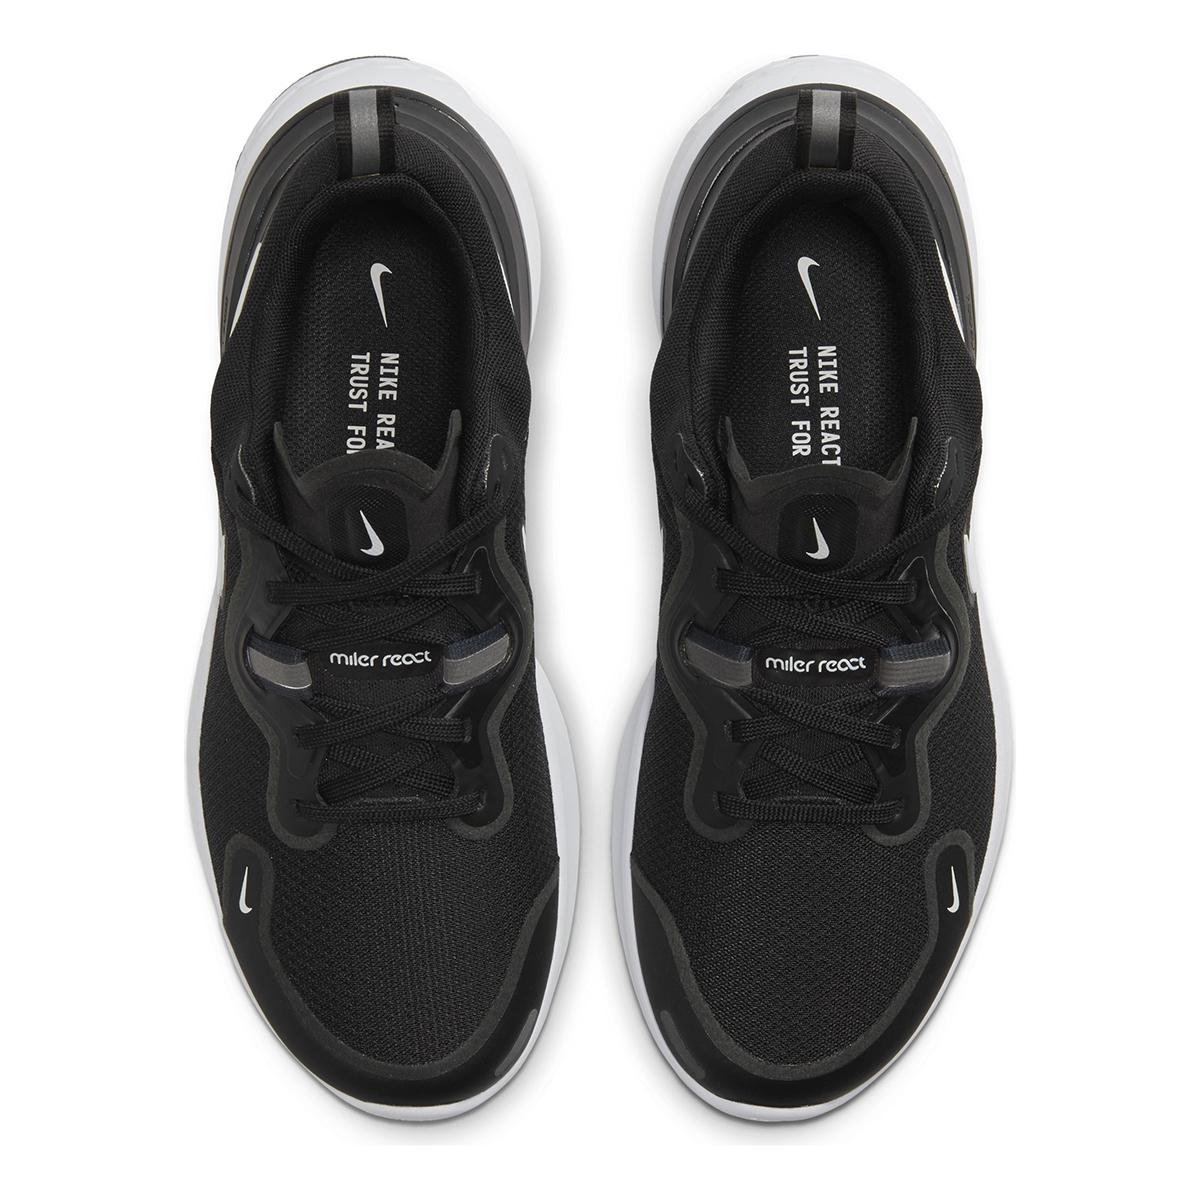 Women's Nike React Miler Running Shoe - Color: Black/Dark Grey/Anthracite/White (Regular Width) - Size: 5, Black/Dark Grey/Anthracite/White, large, image 5